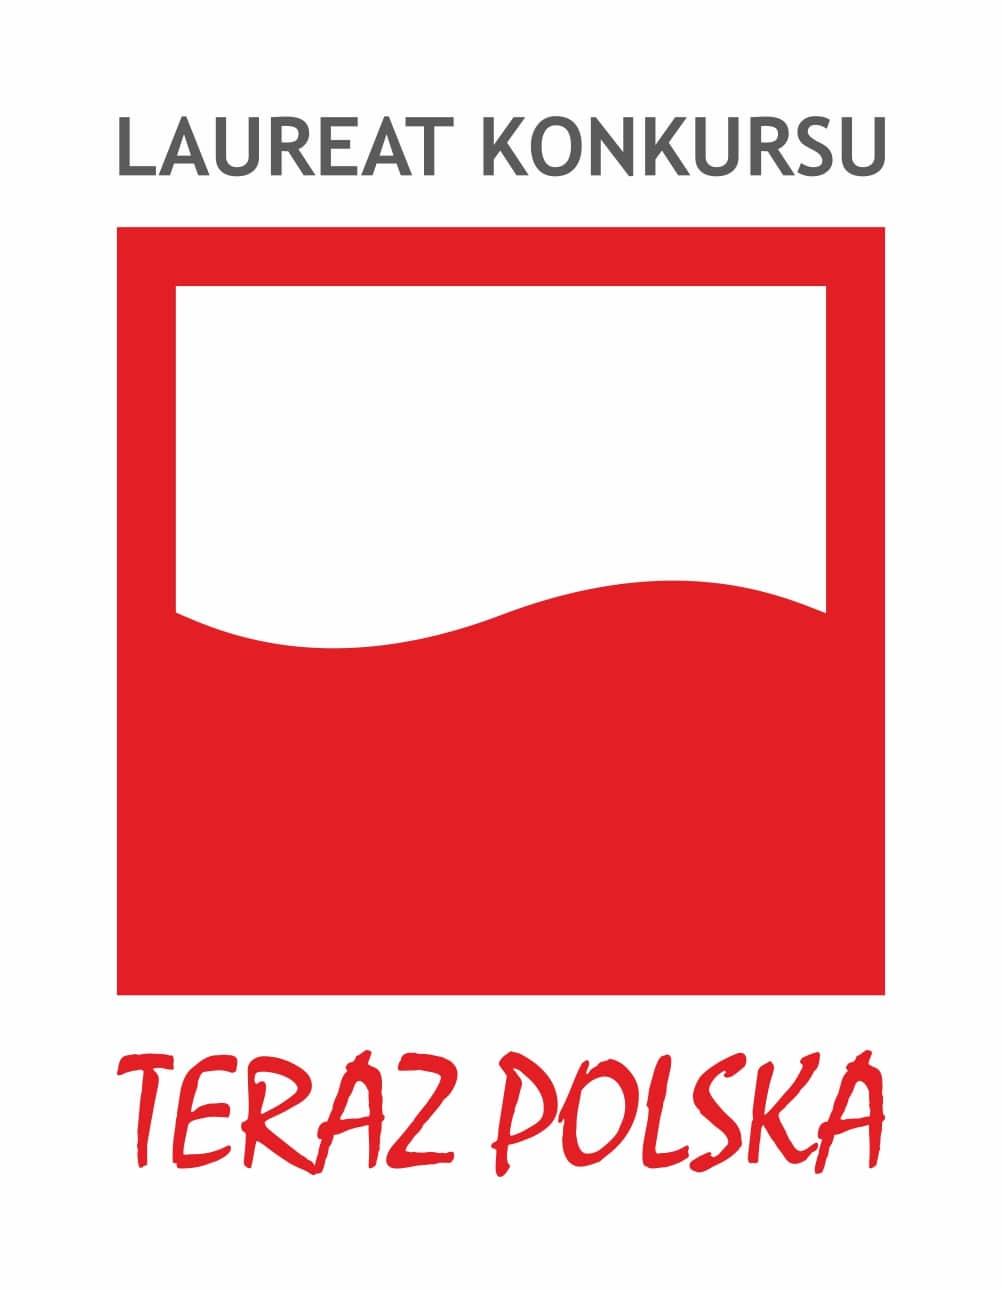 teraz polska gmina zukowo 1